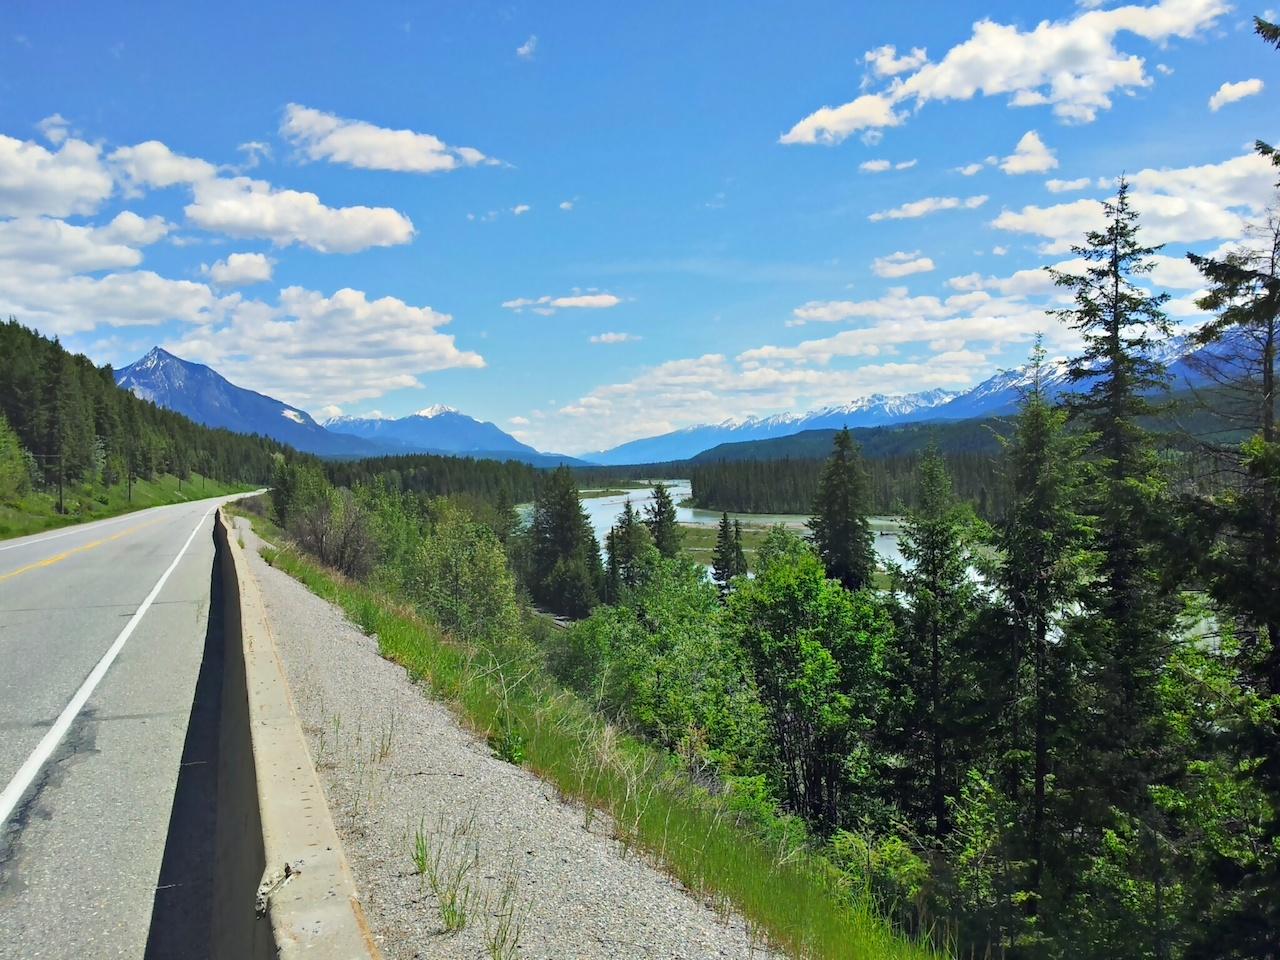 Columbia river a Transcanada highway - hned u odbočki k našim srubům